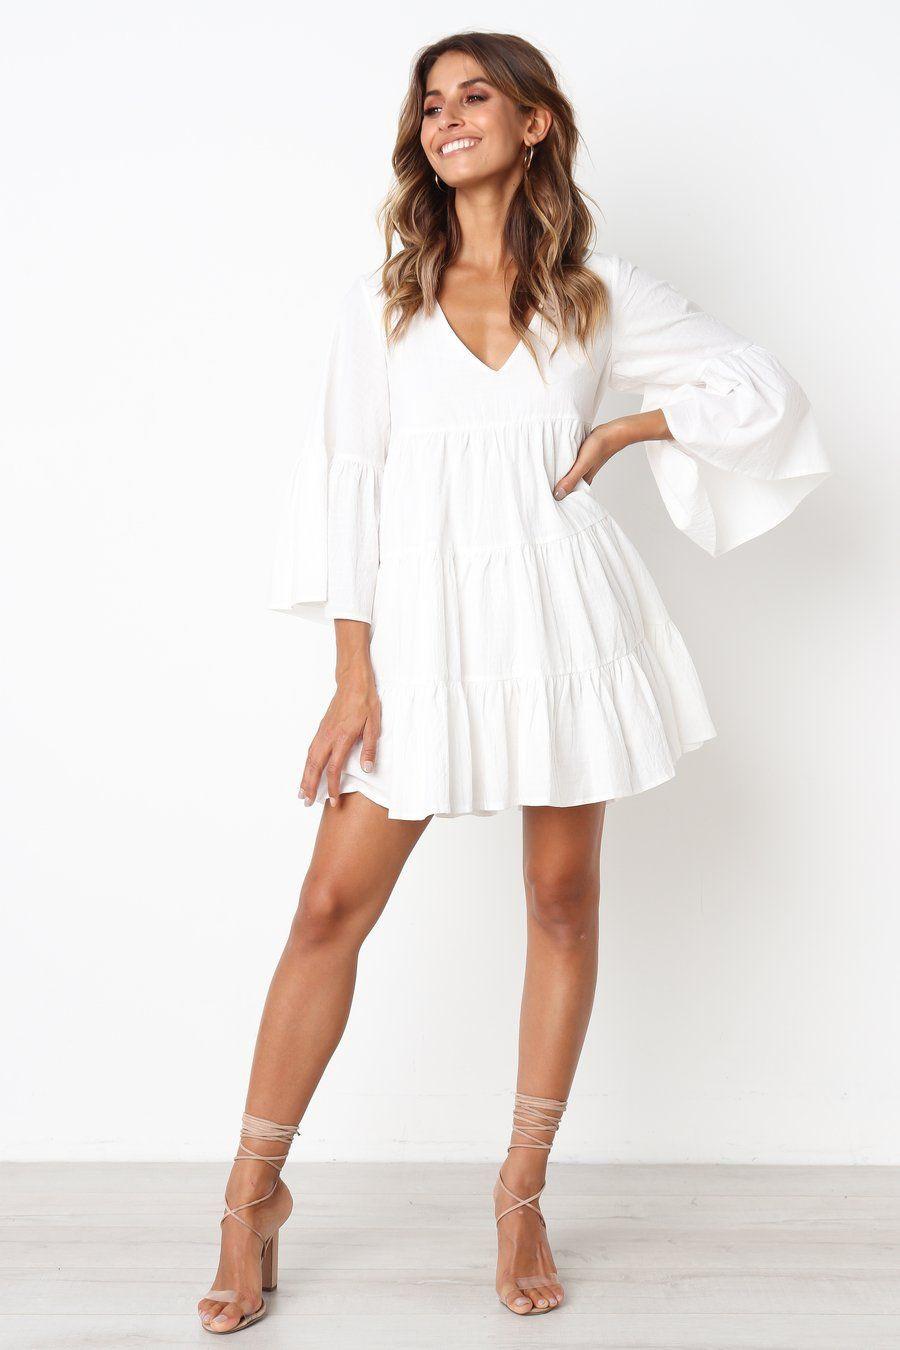 White long sleeve flowy dress